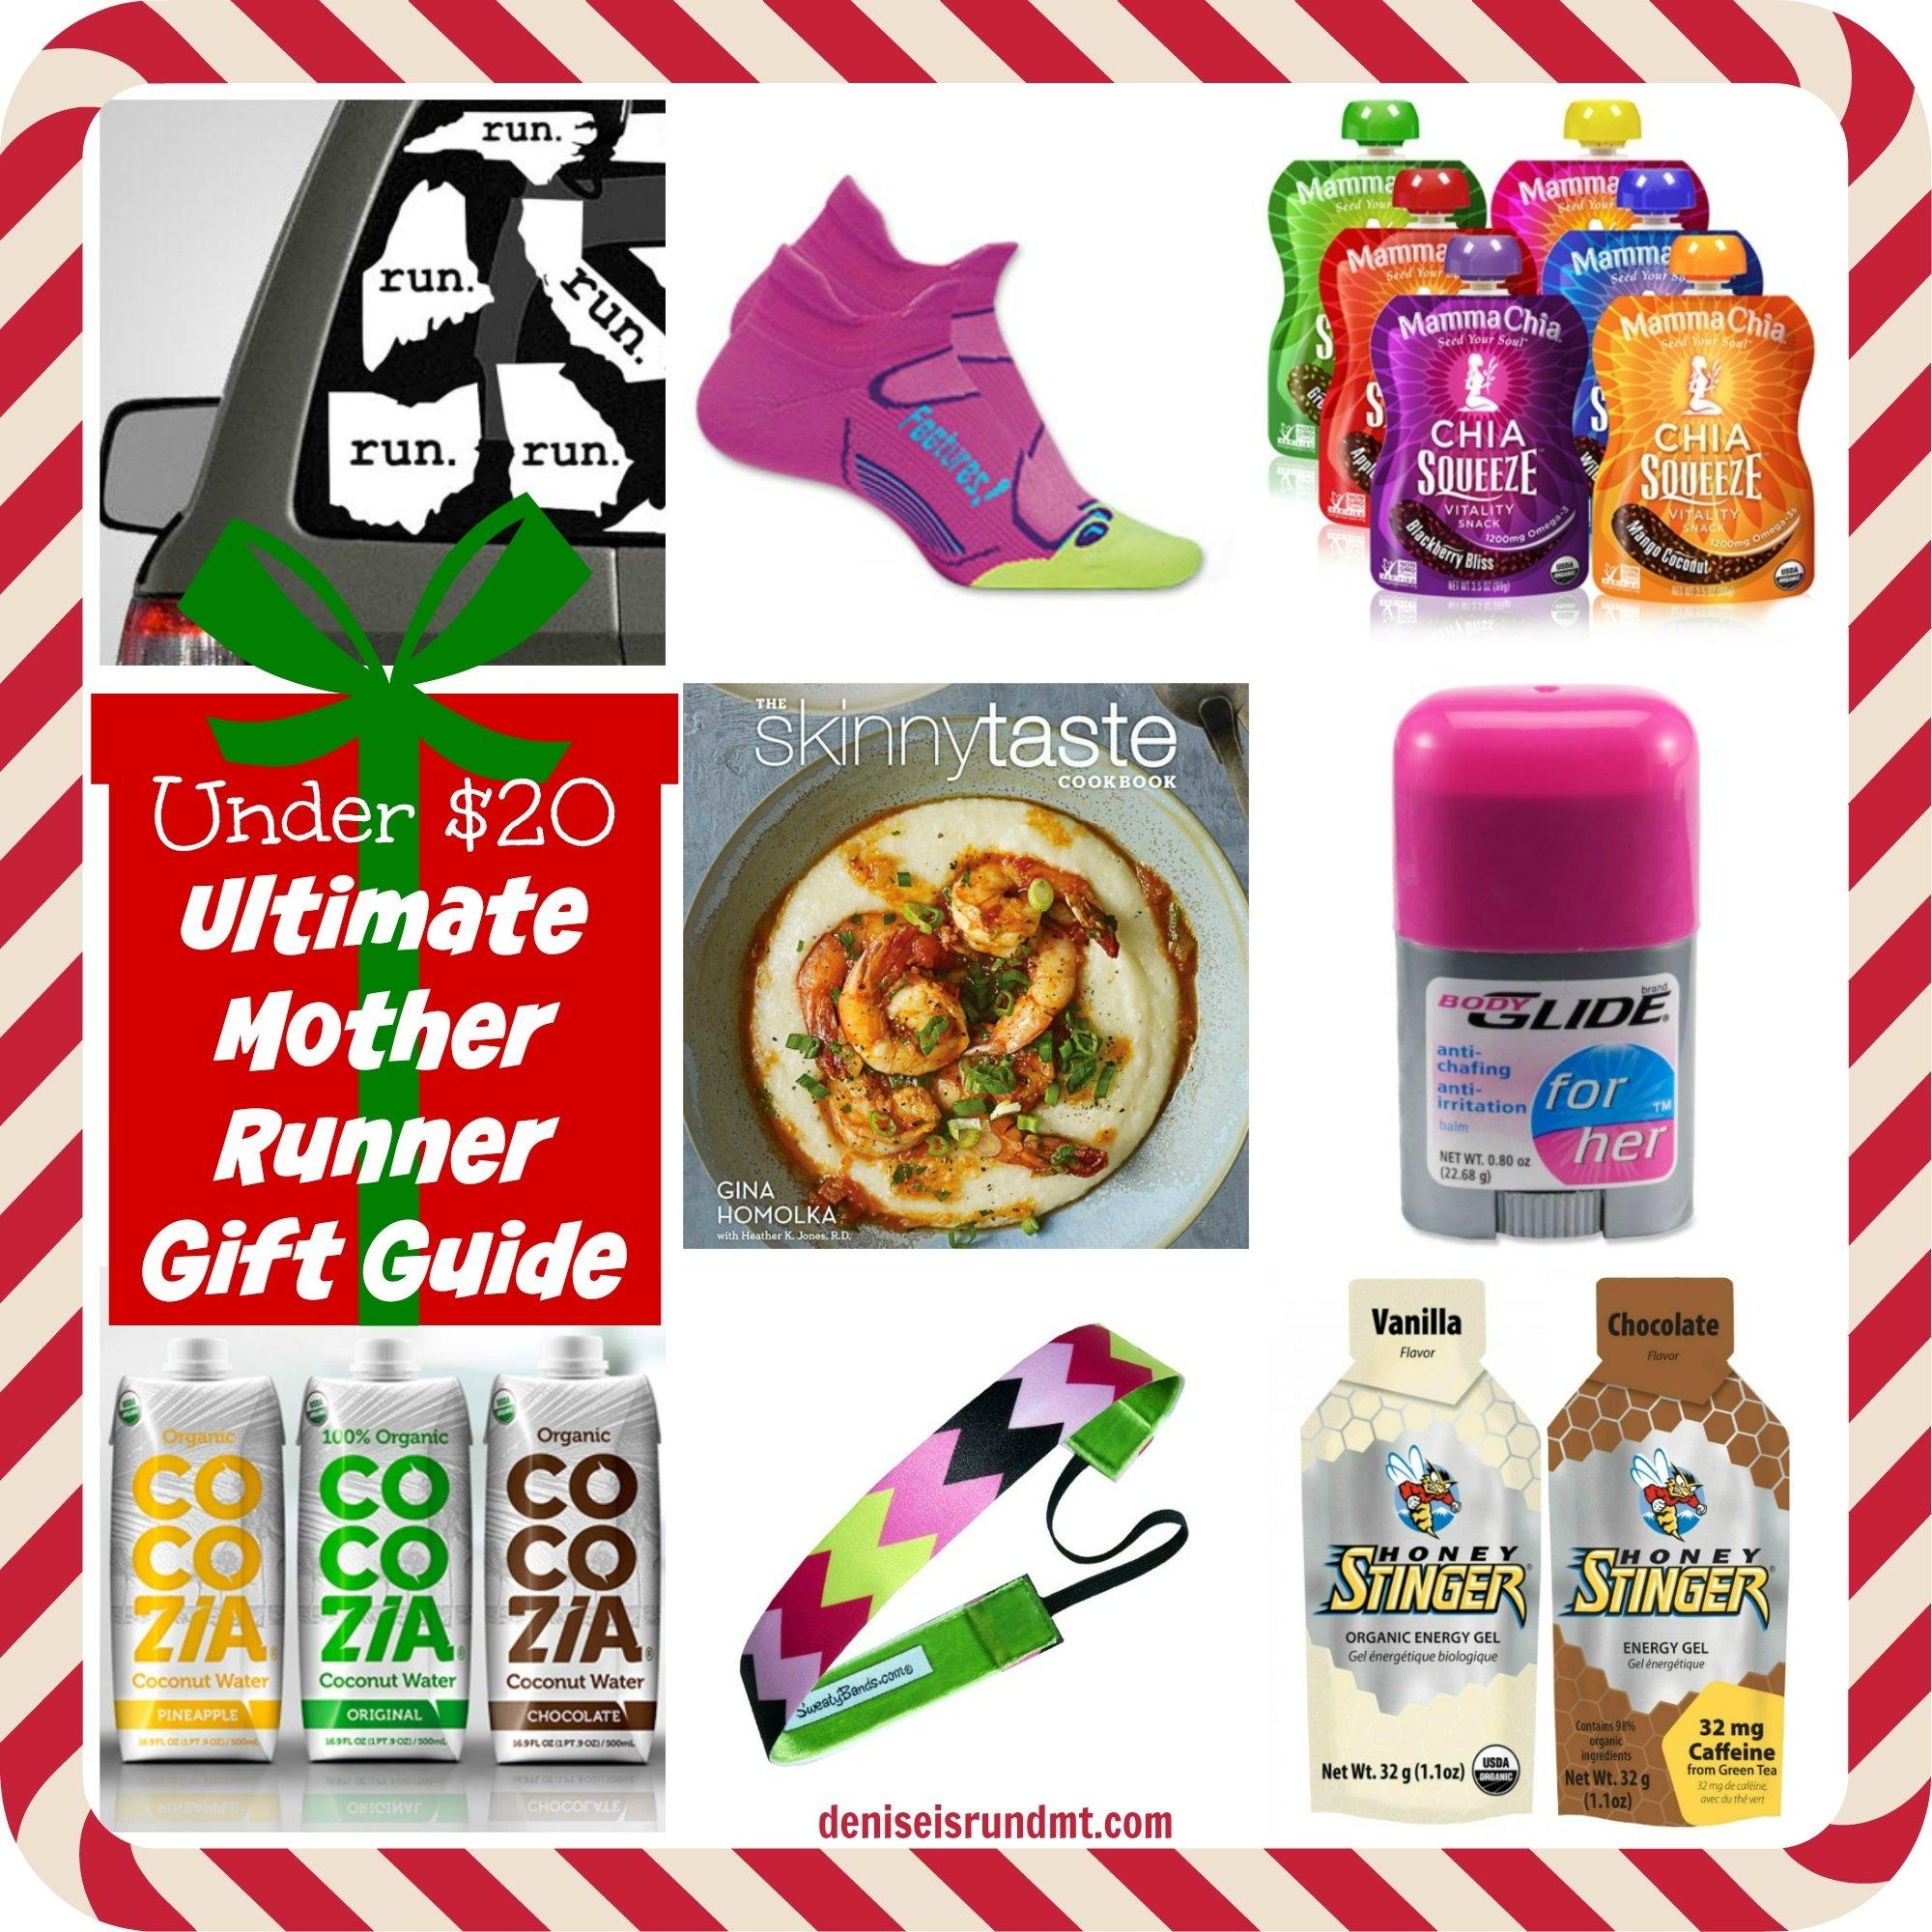 under $20 christmas gift ideas for runners - run dmt